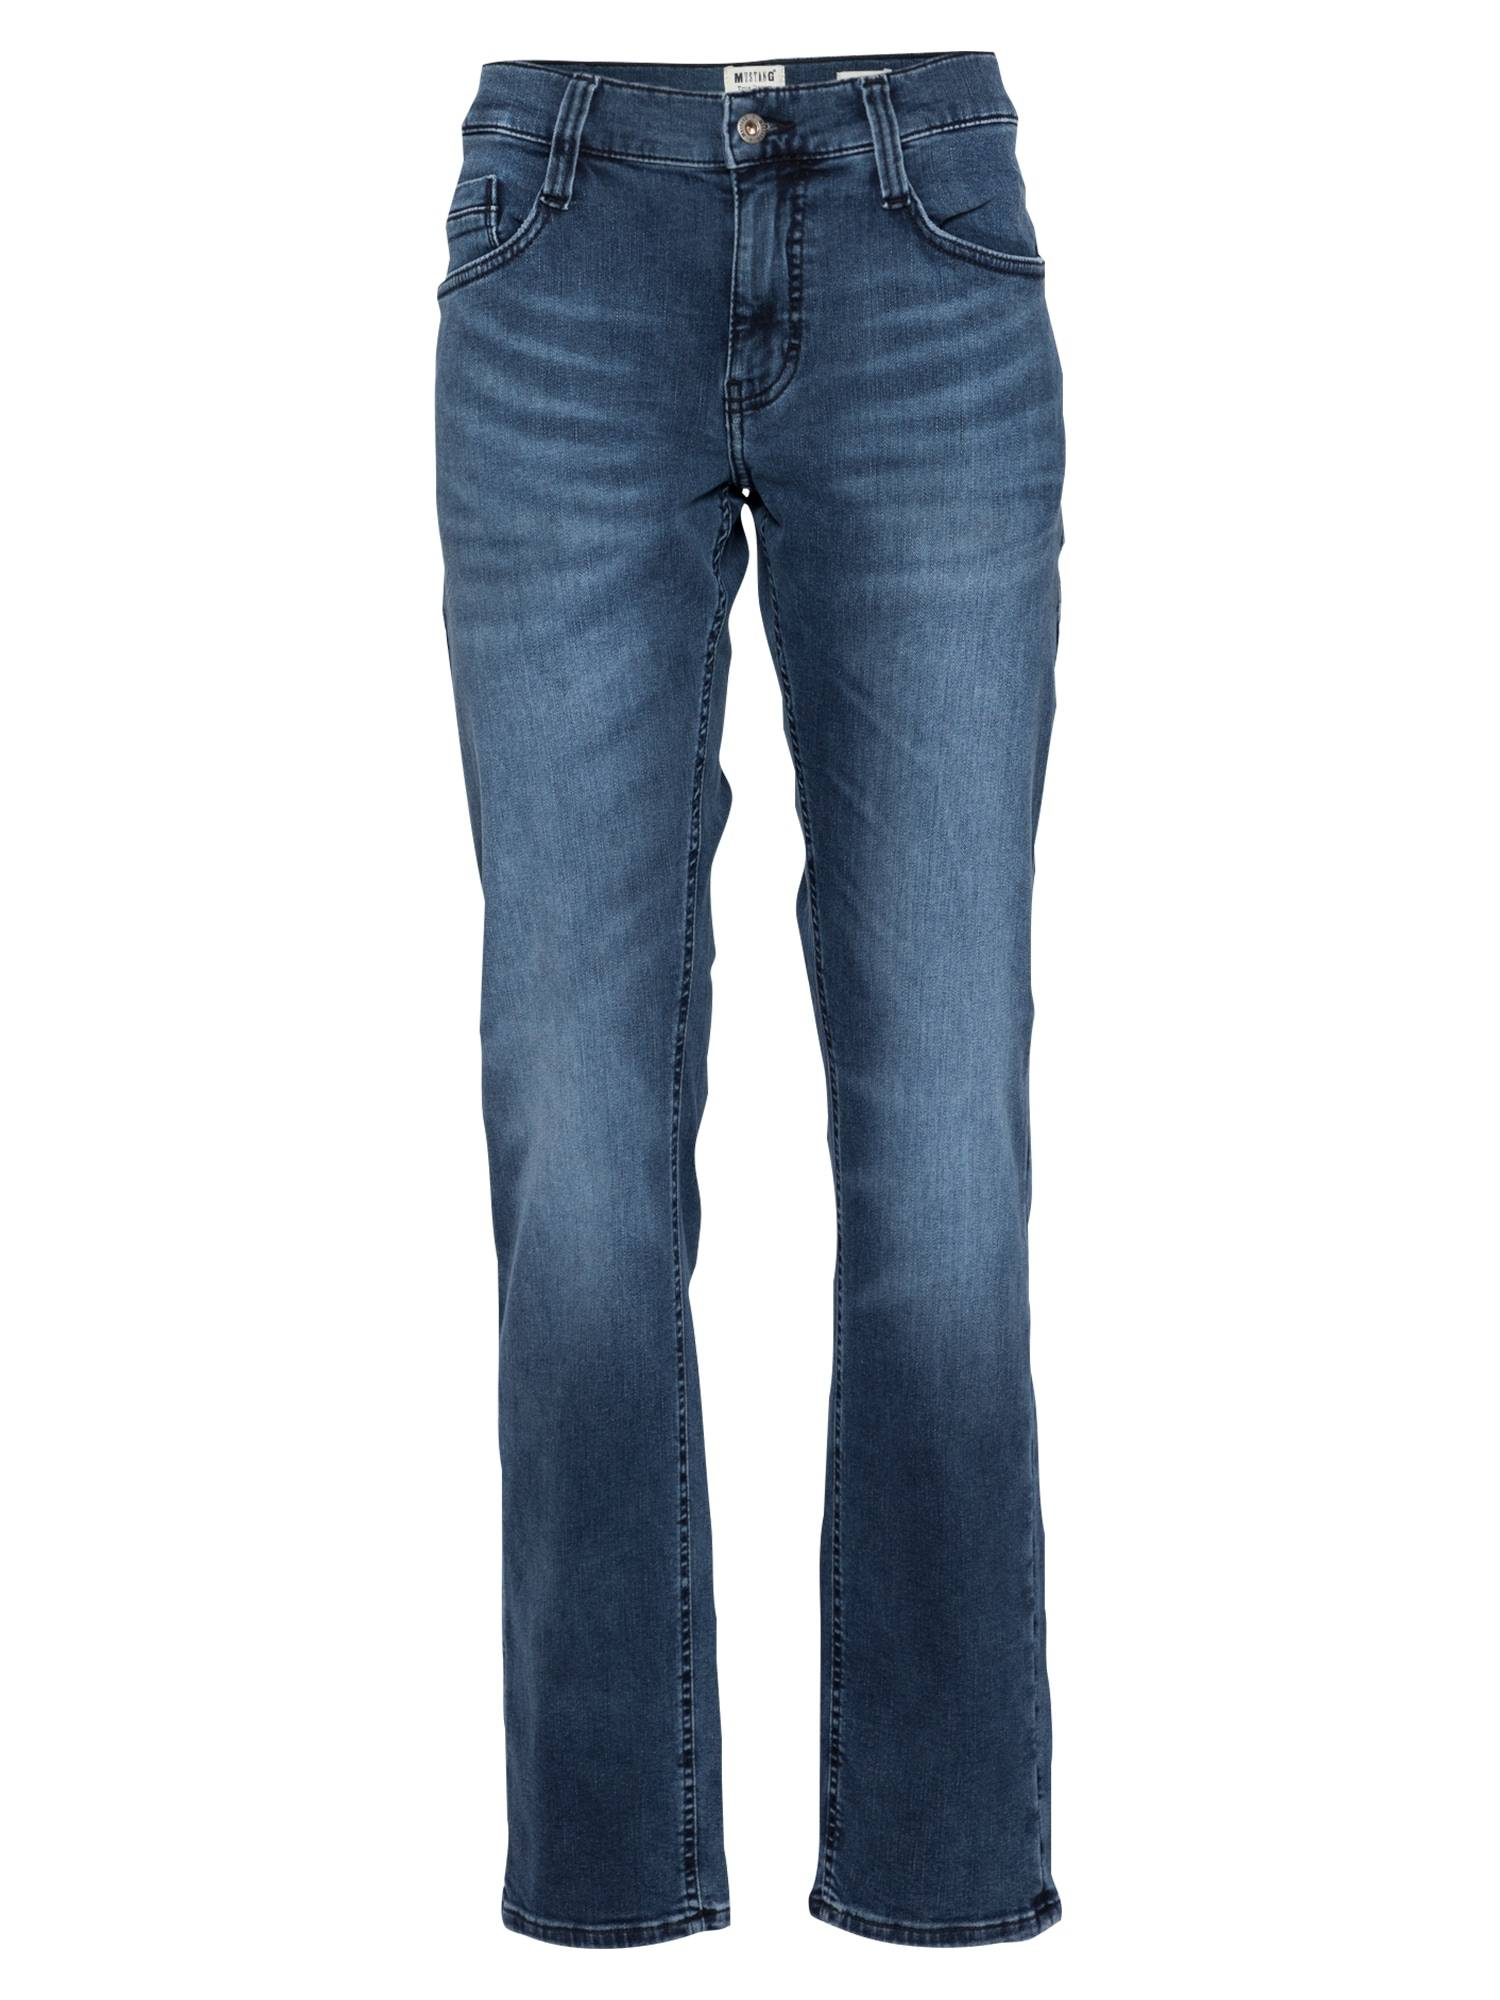 MUSTANG Jean 'Oregon'  - Bleu - Taille: 36/34 - male